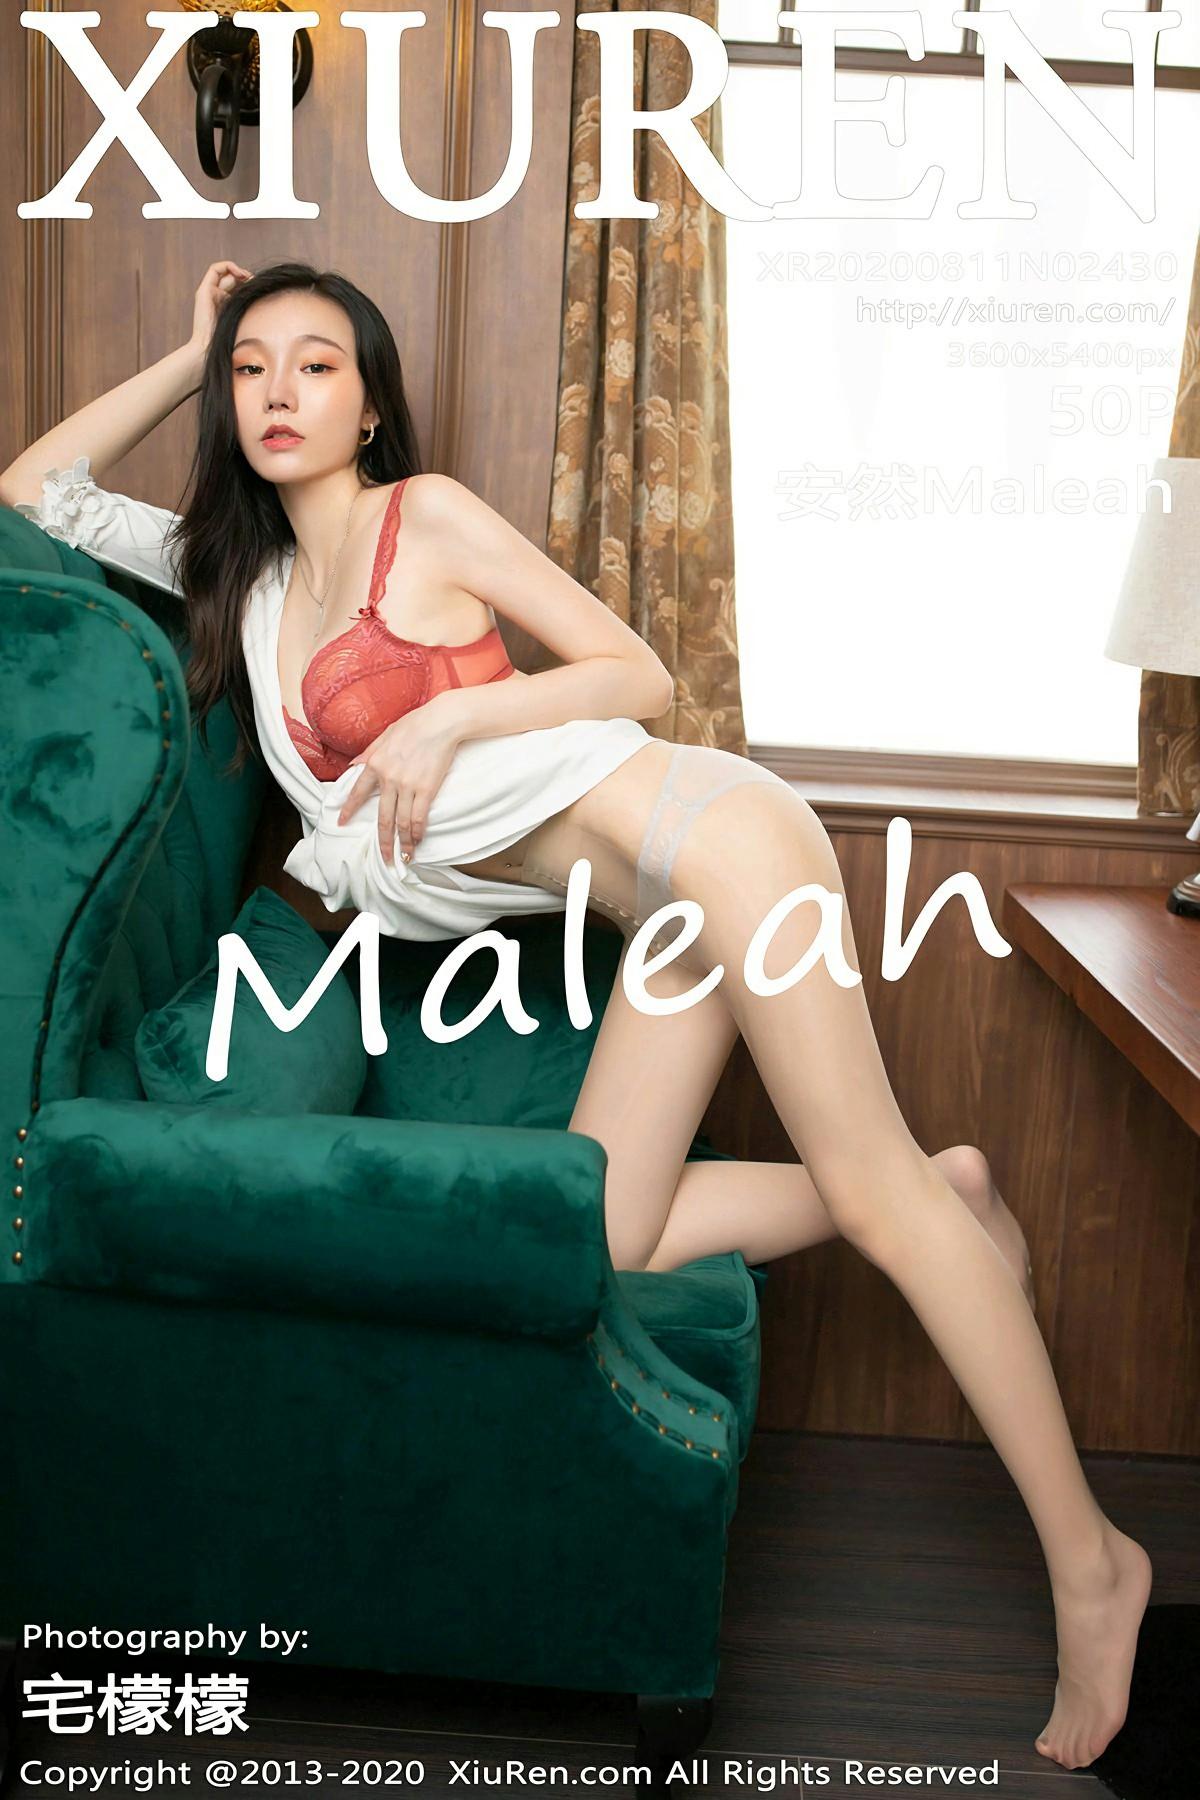 [XiuRen秀人网] 2020.08.11 No.2430 安然Maleah 第1张